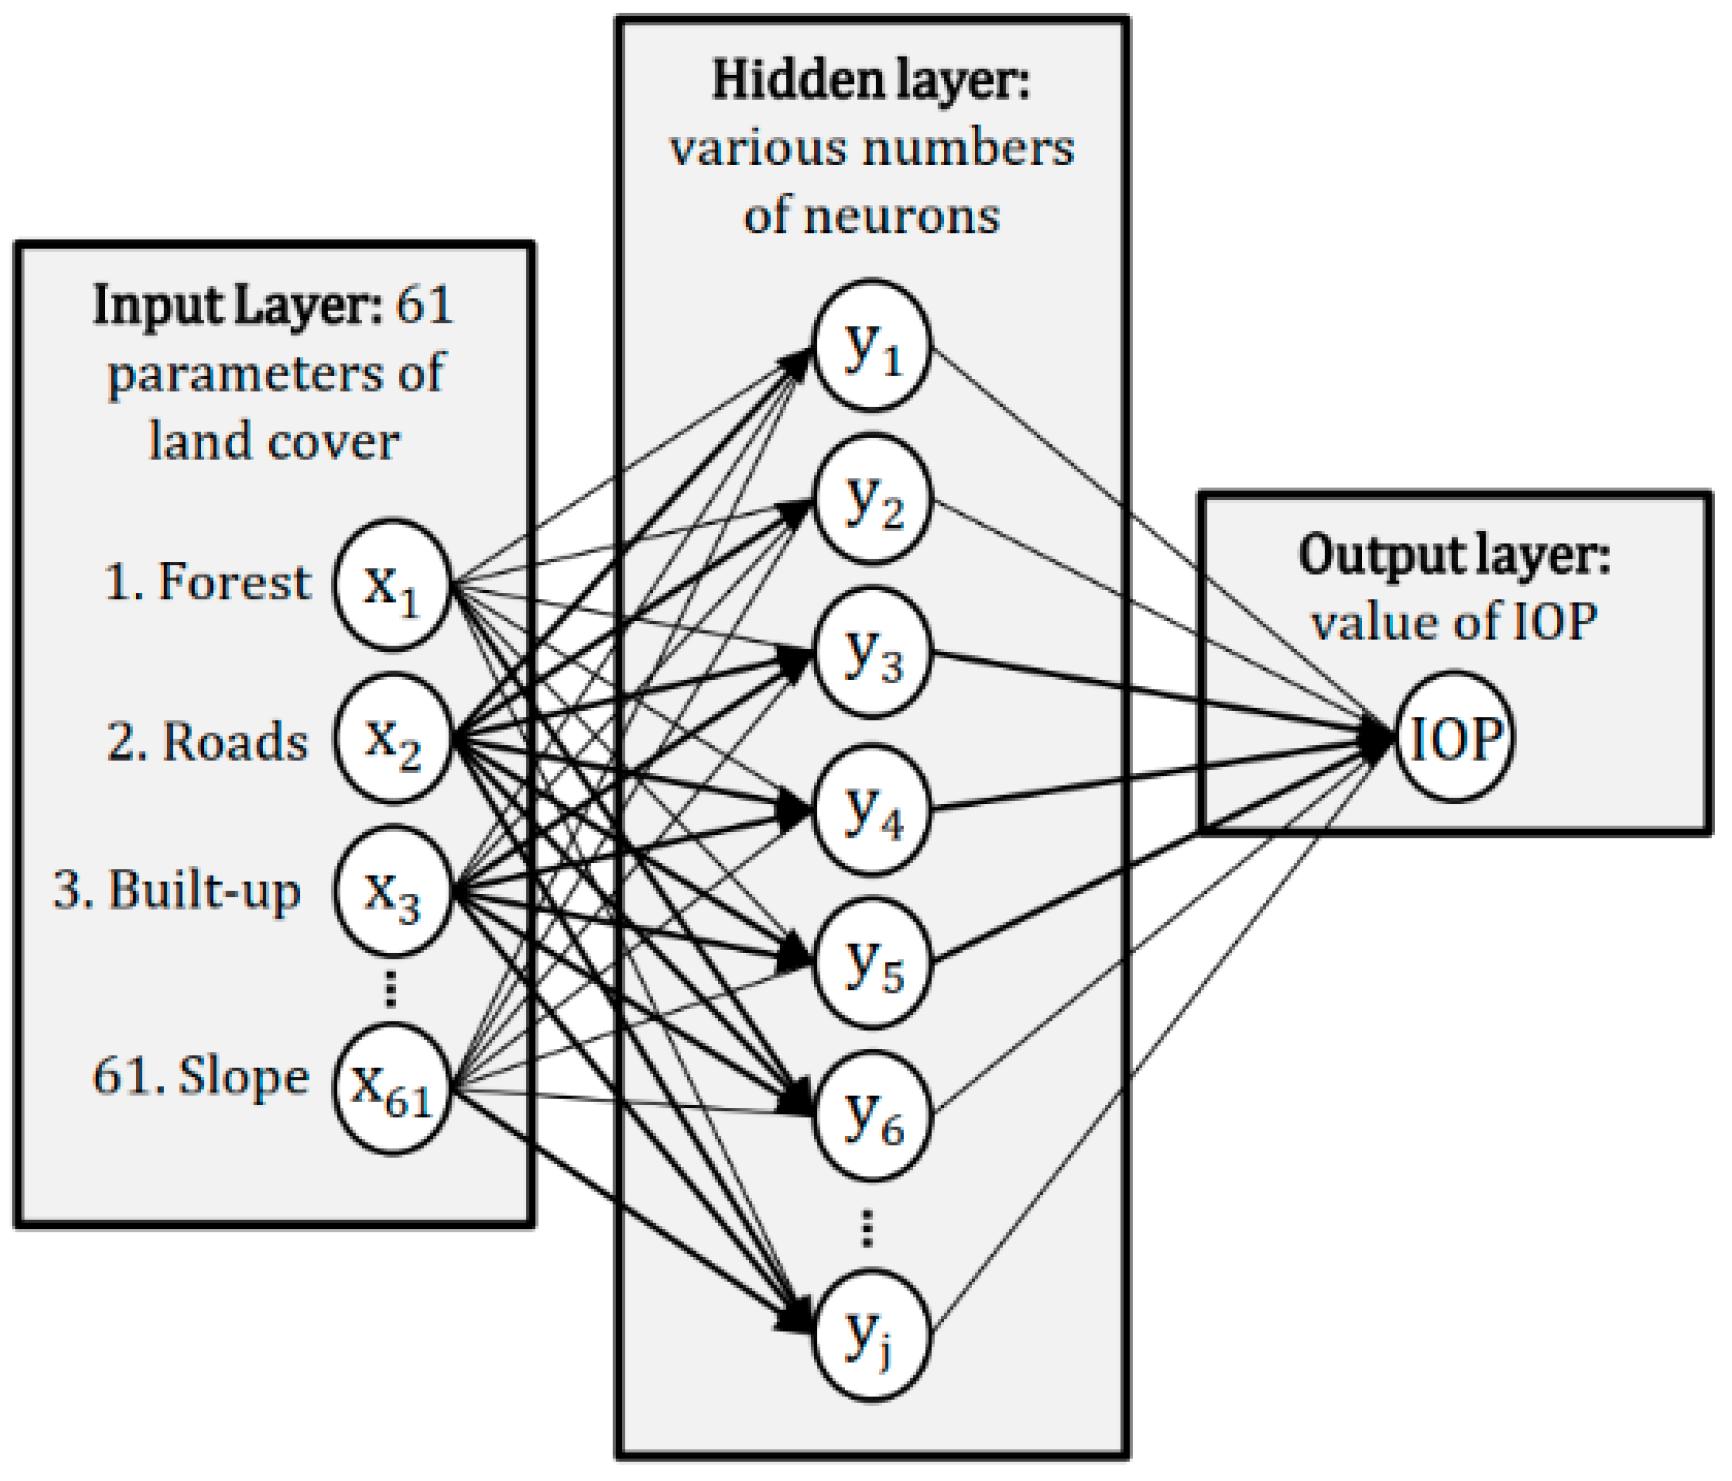 Multilayer perceptron